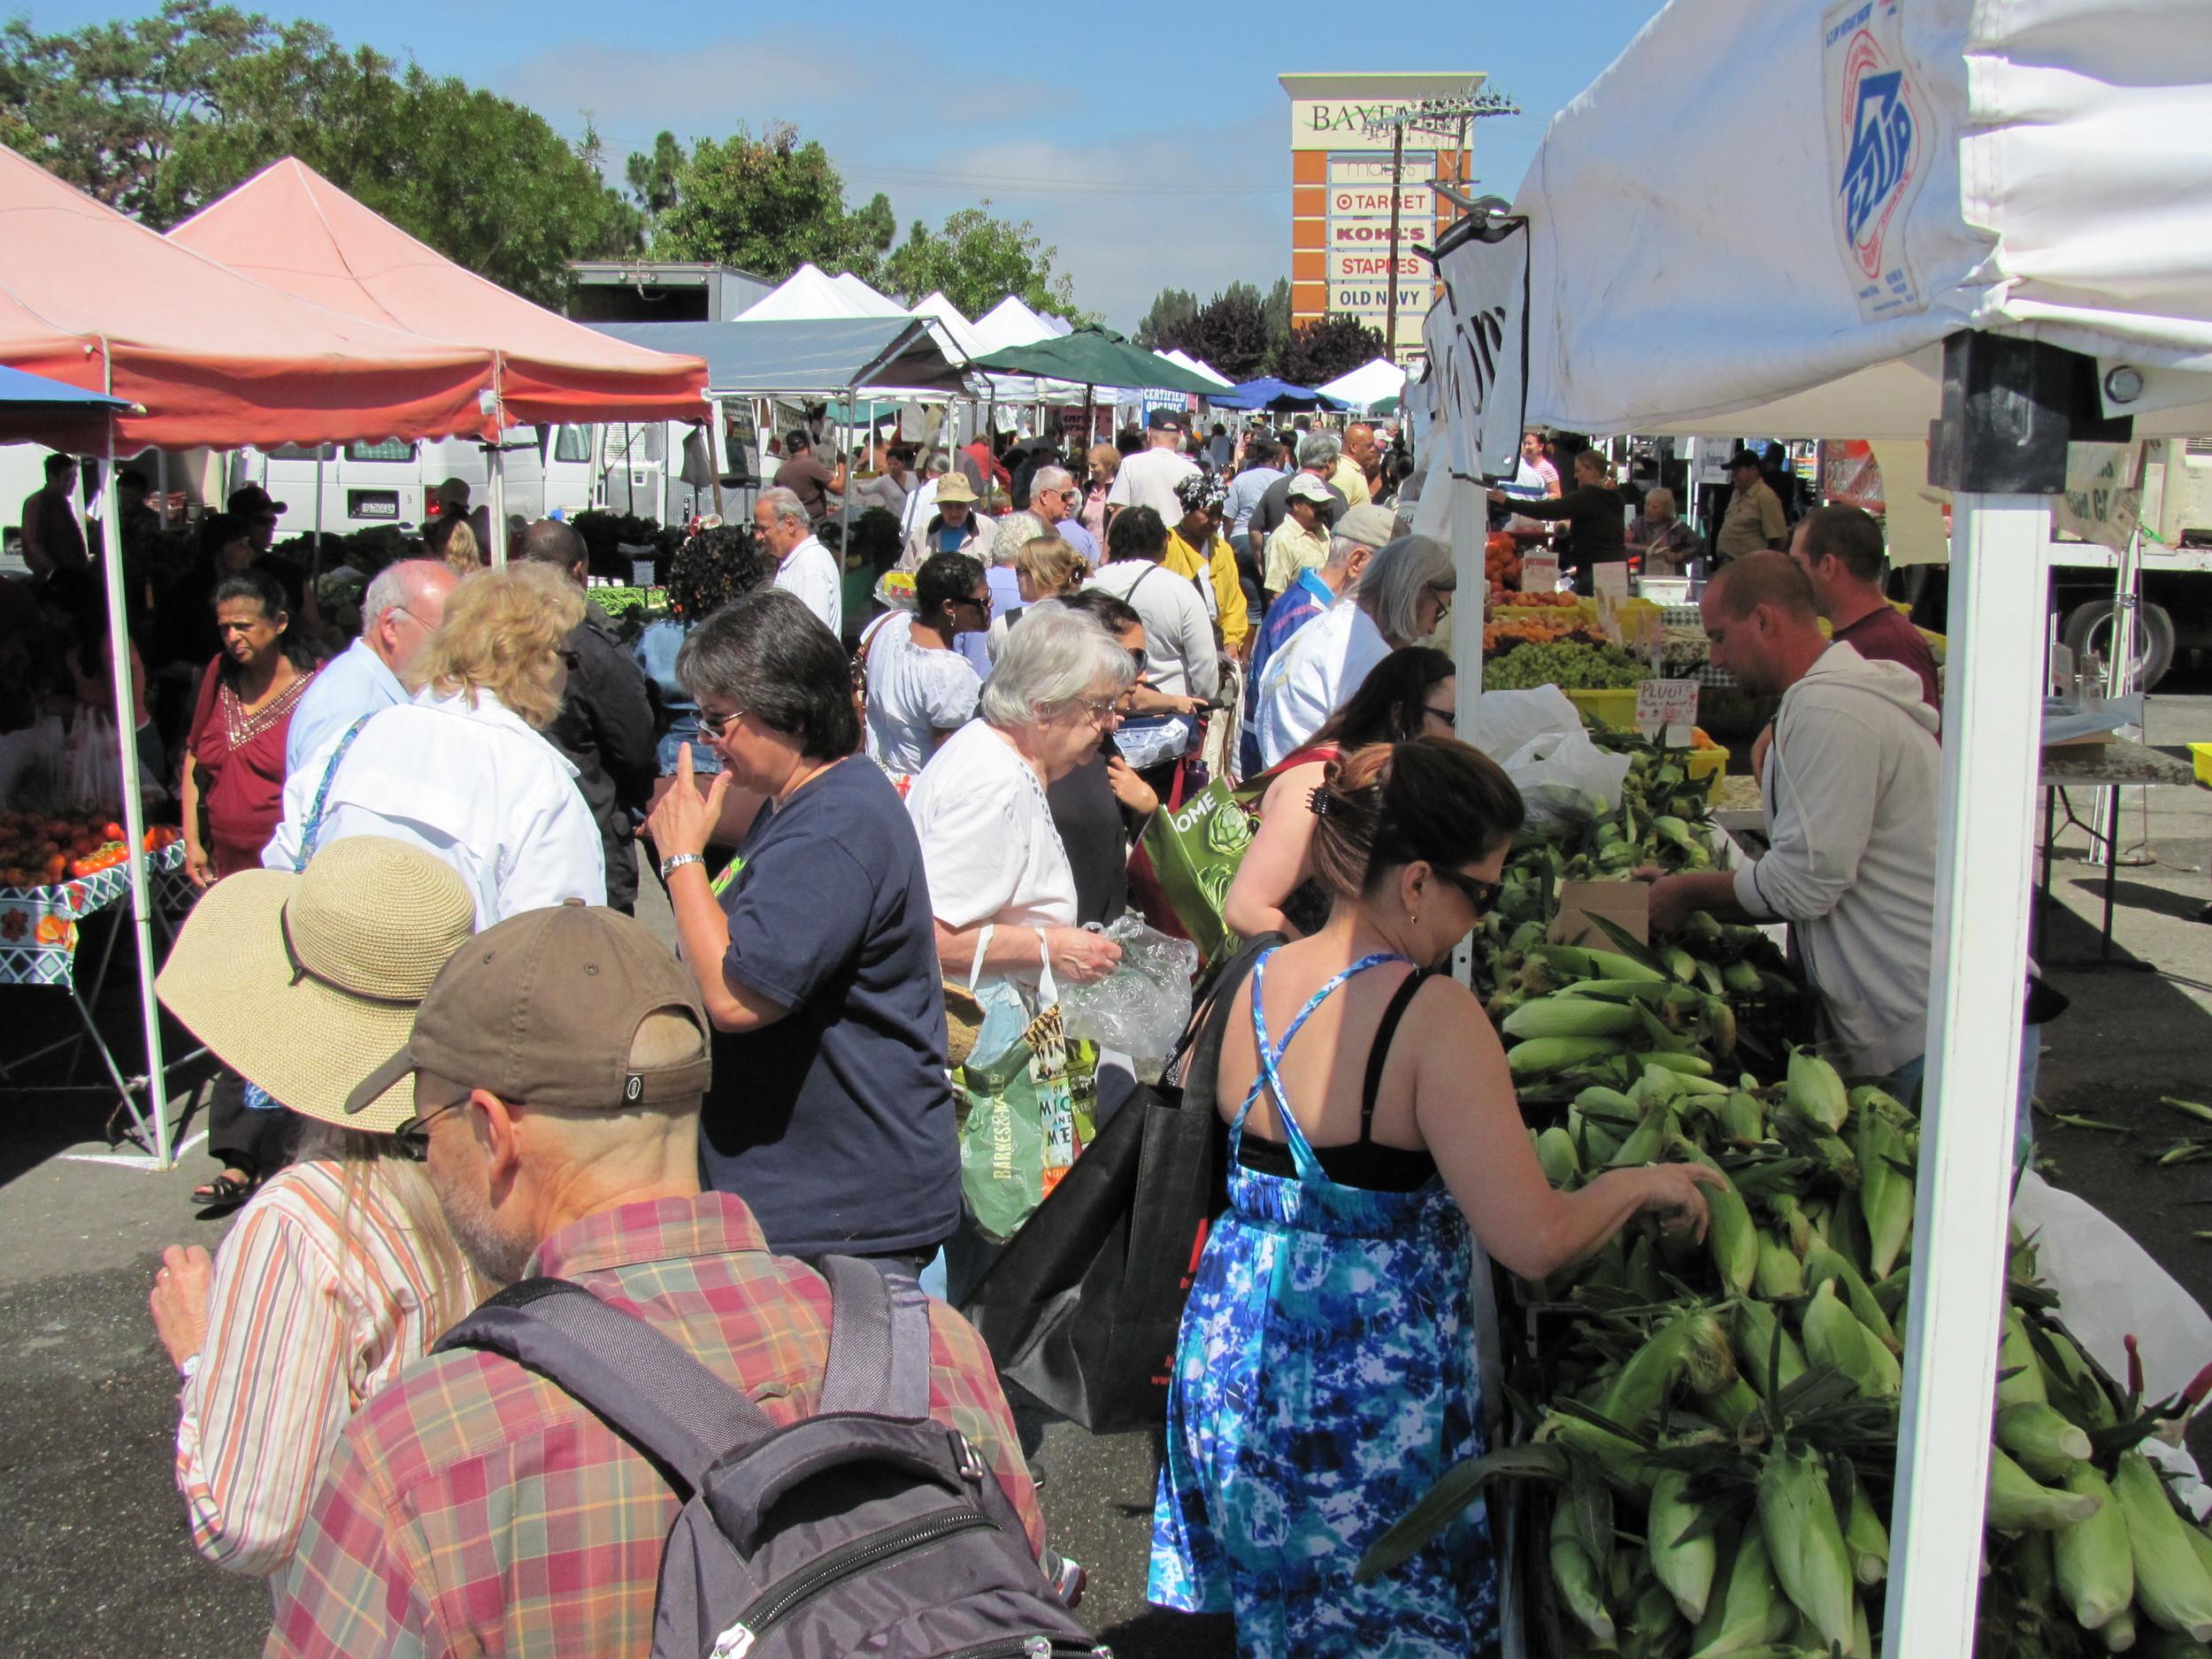 San Leandro Farmers' Market at Bayfair Center